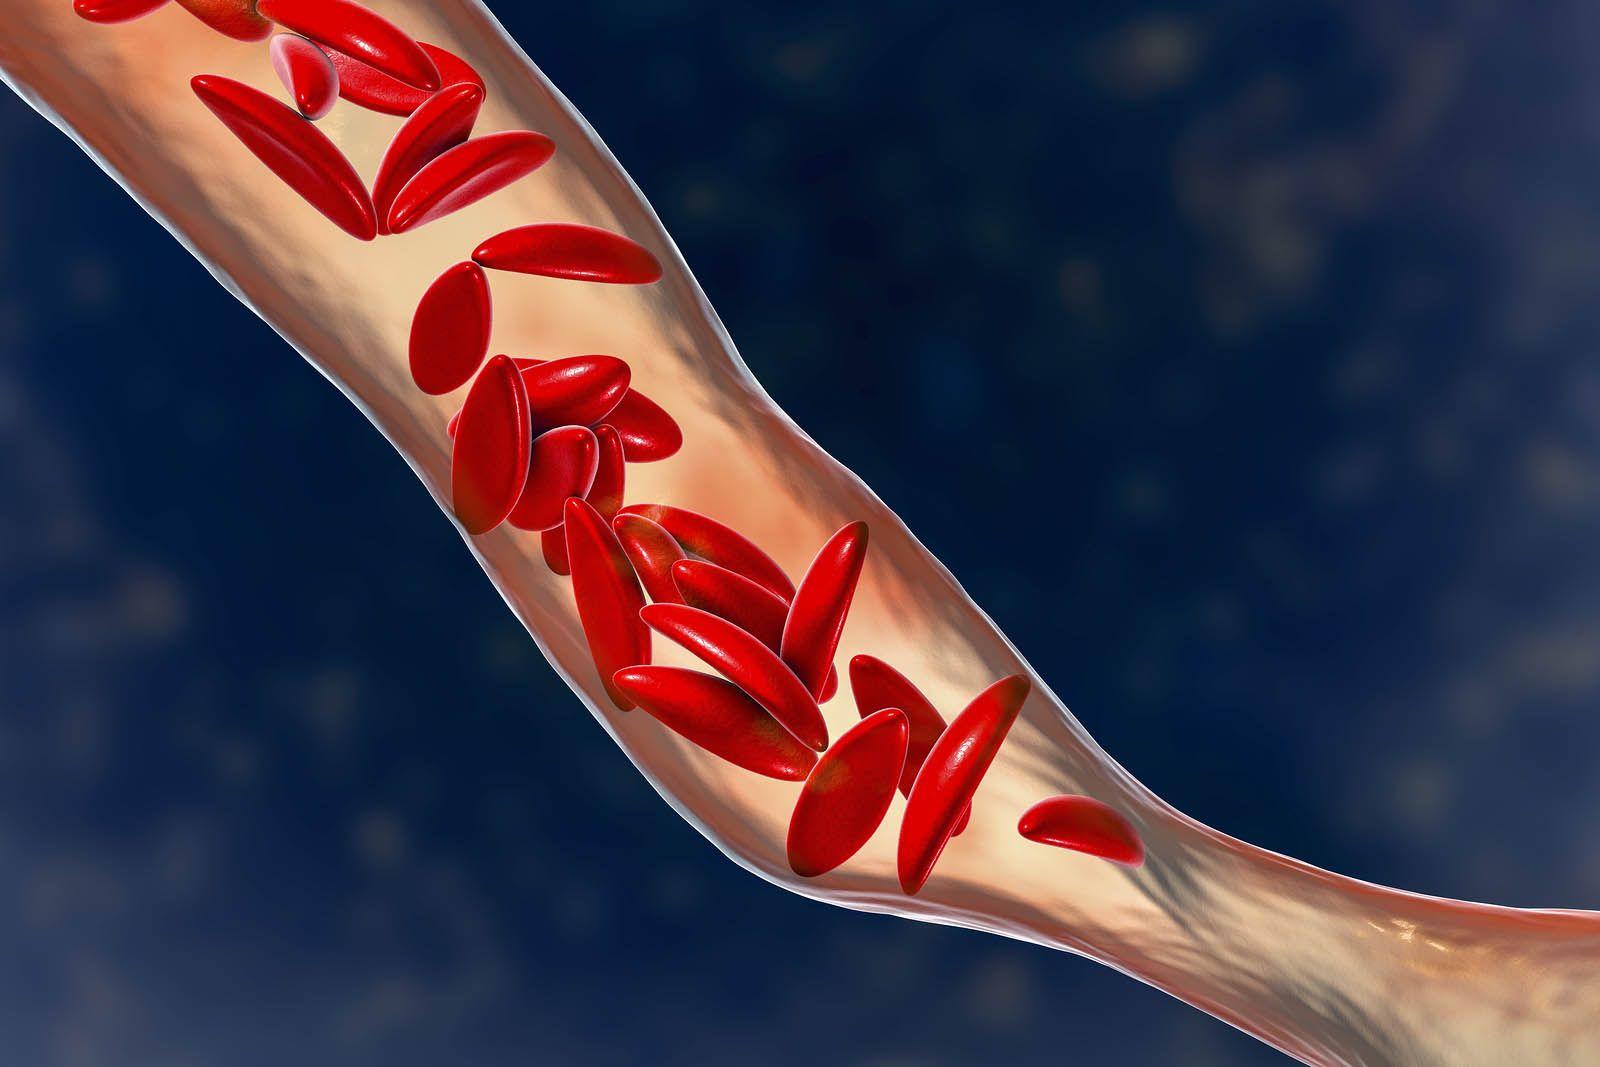 Qué es la anemia drepanocítica